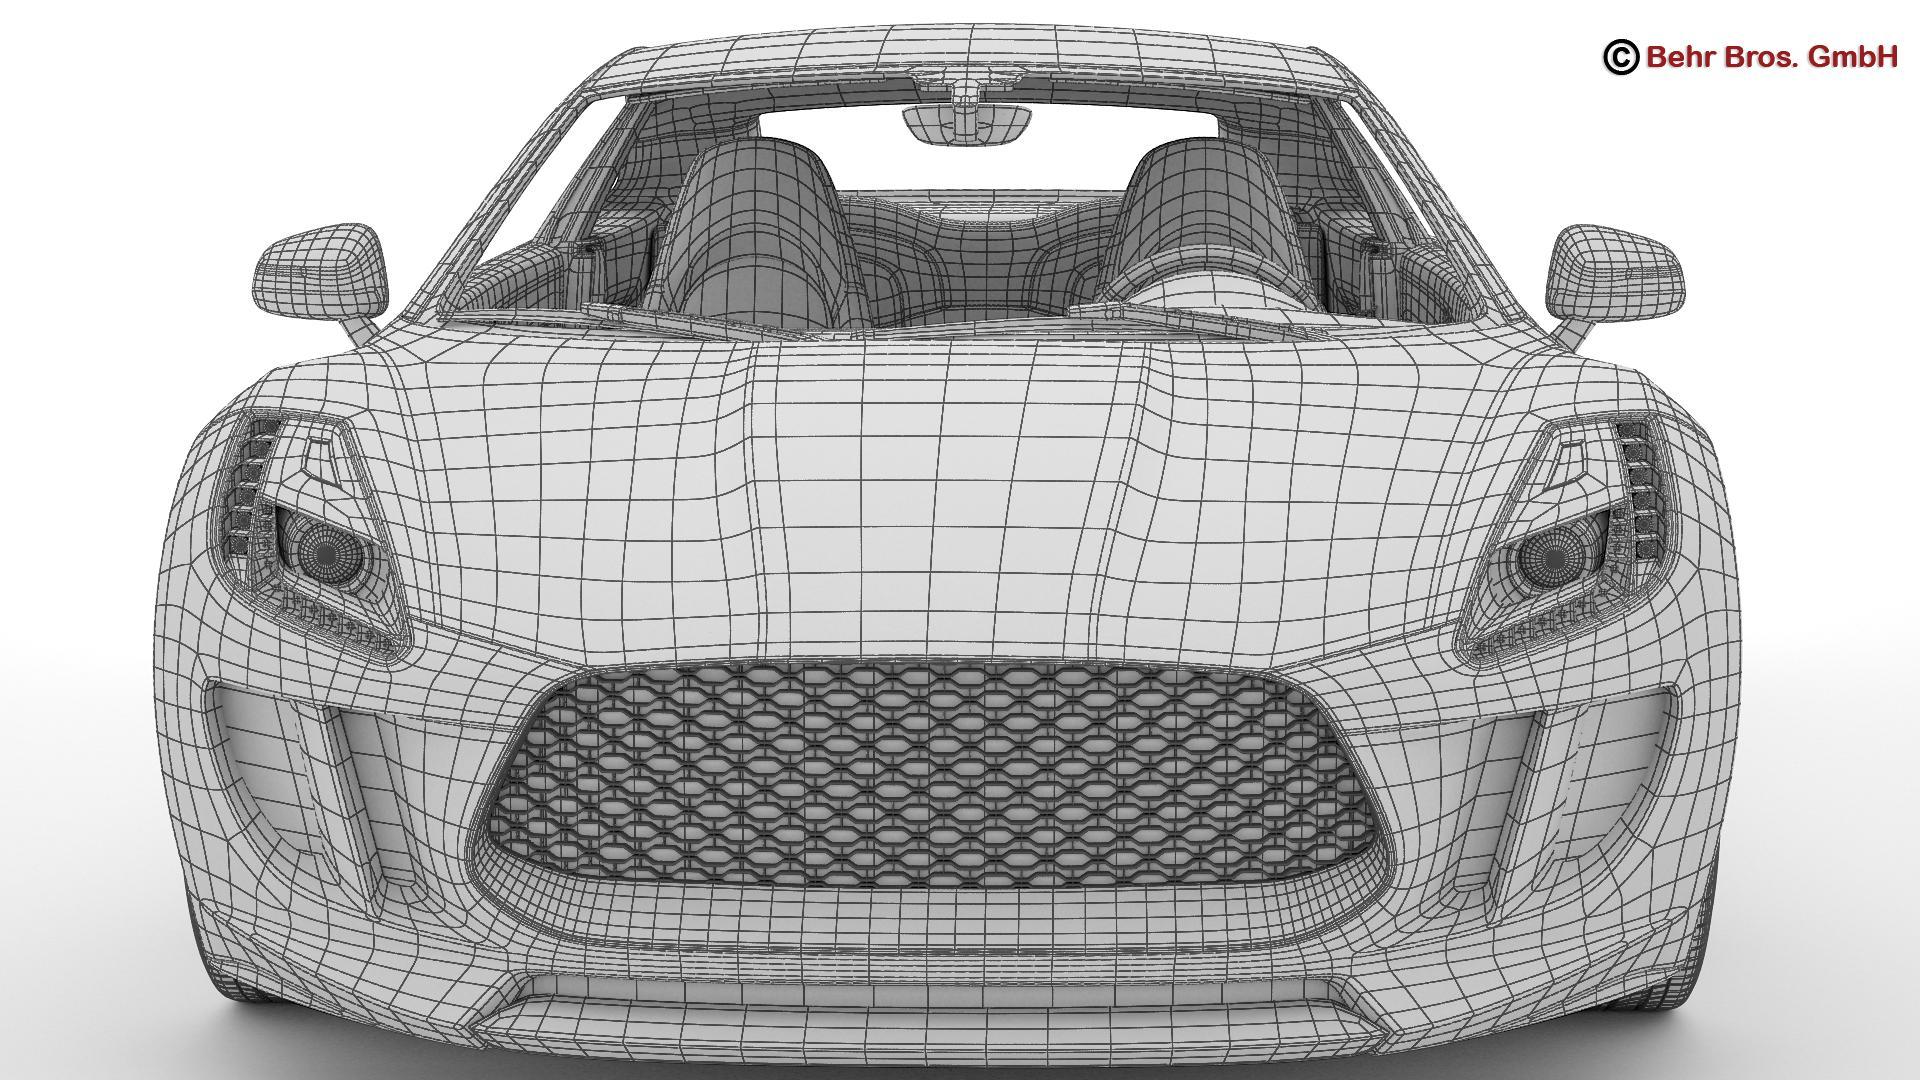 generic sports car 3d model 3ds max fbx c4d lwo ma mb obj 160541